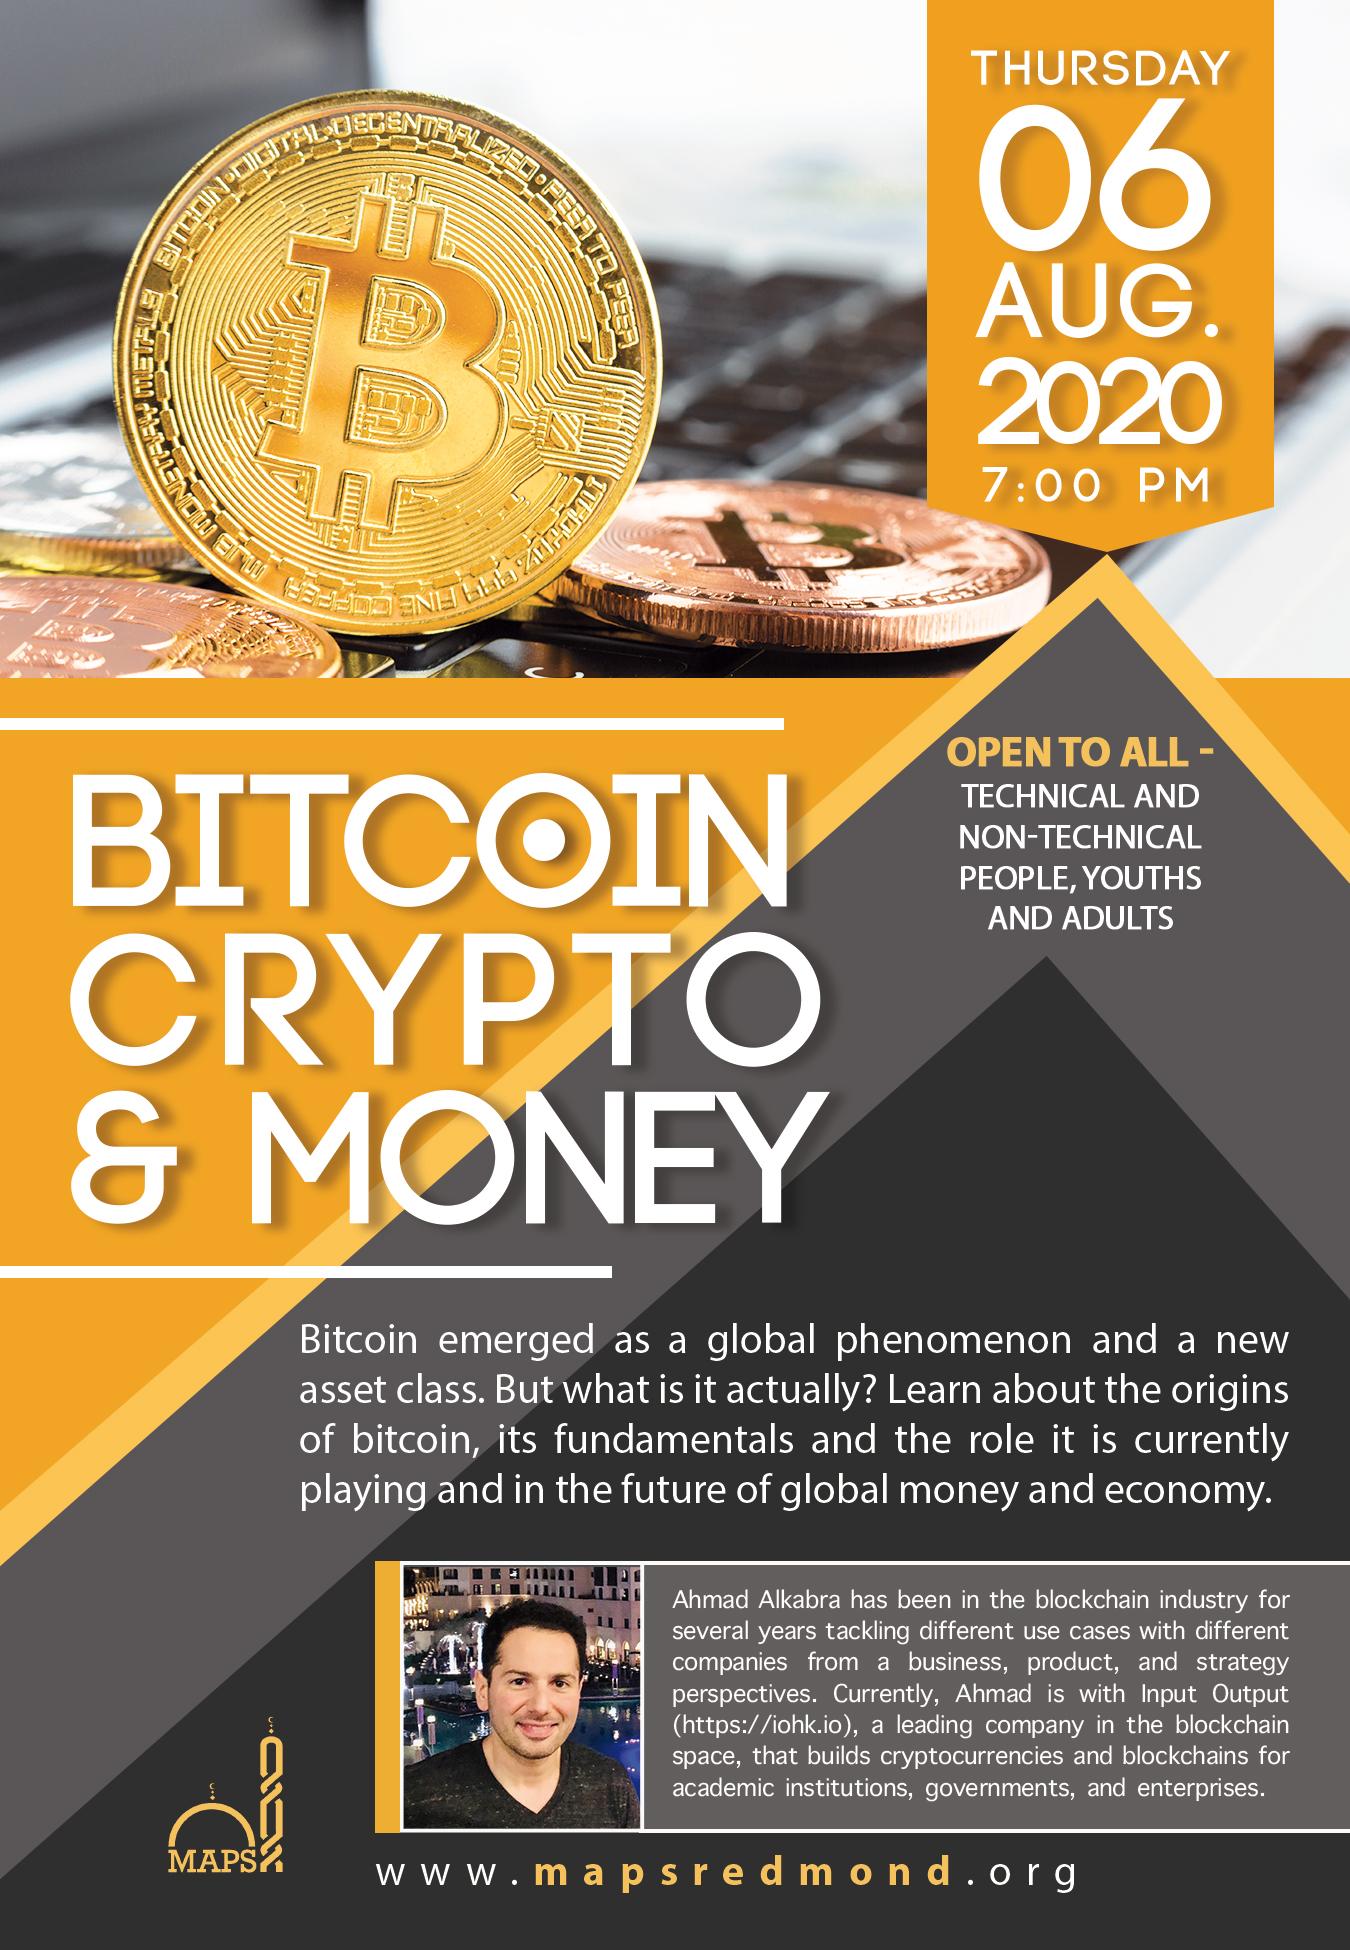 Where to buy super bitcoin